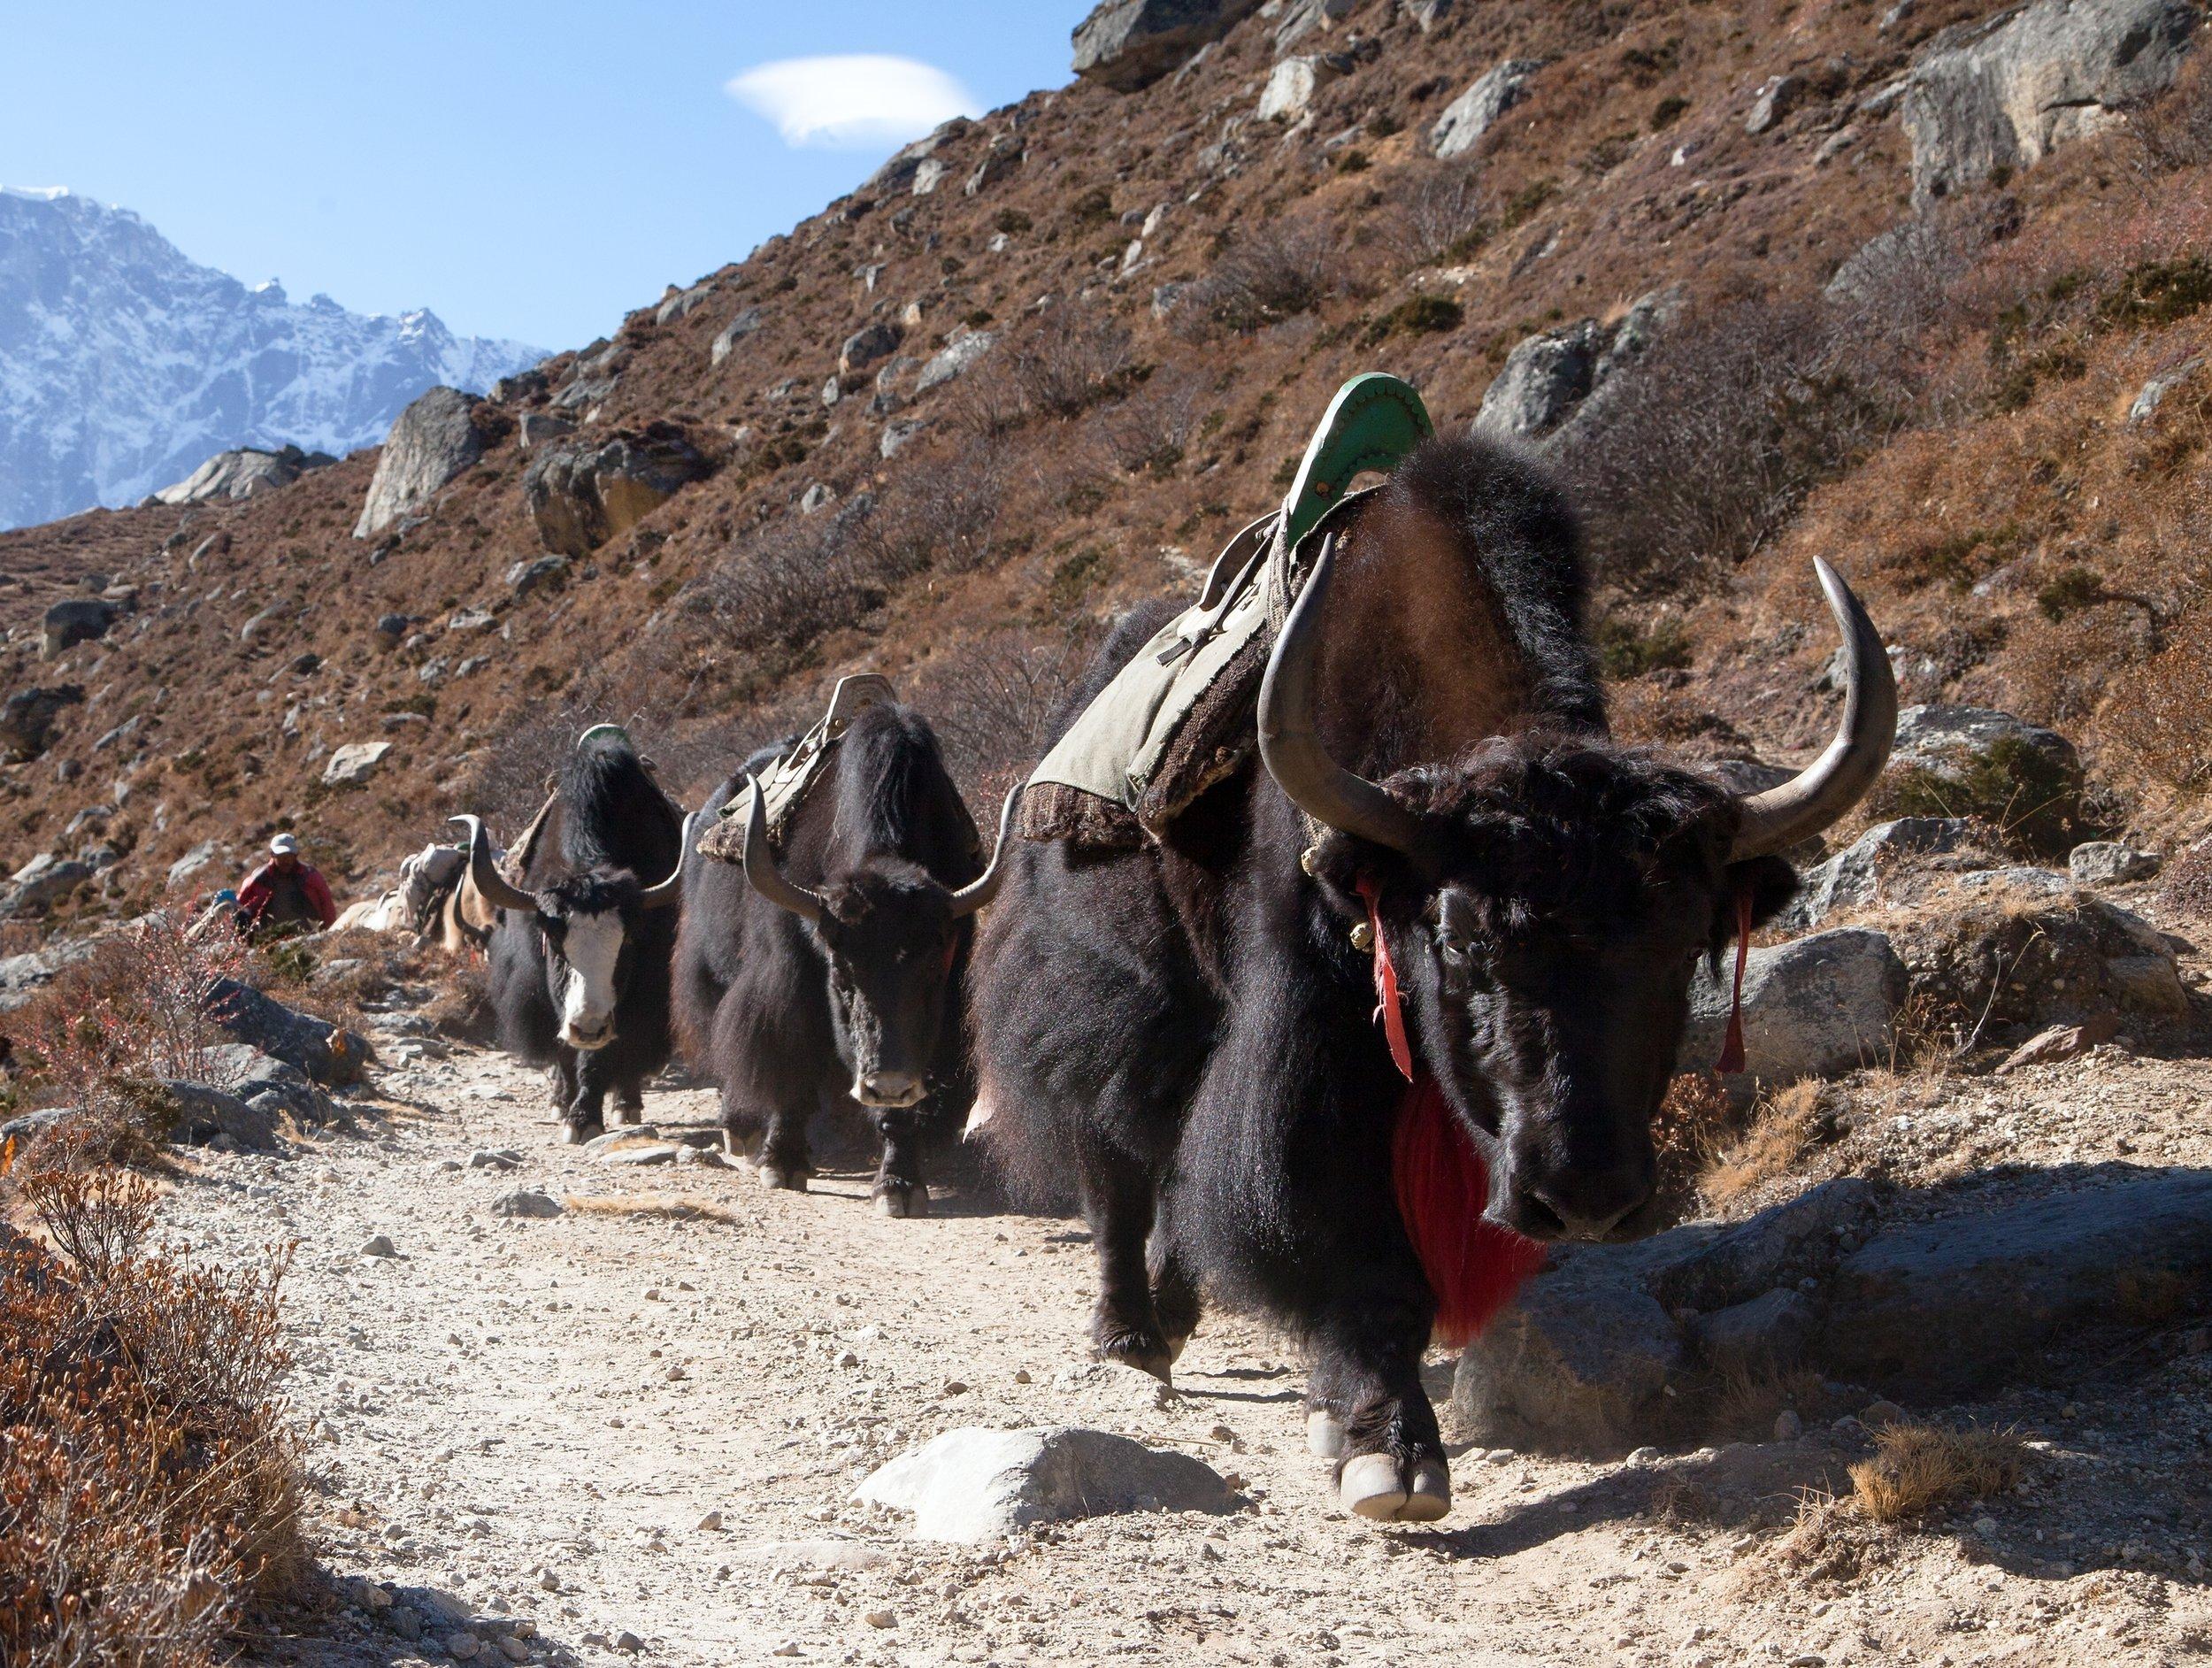 Yak in Khumbu valley, Nepal